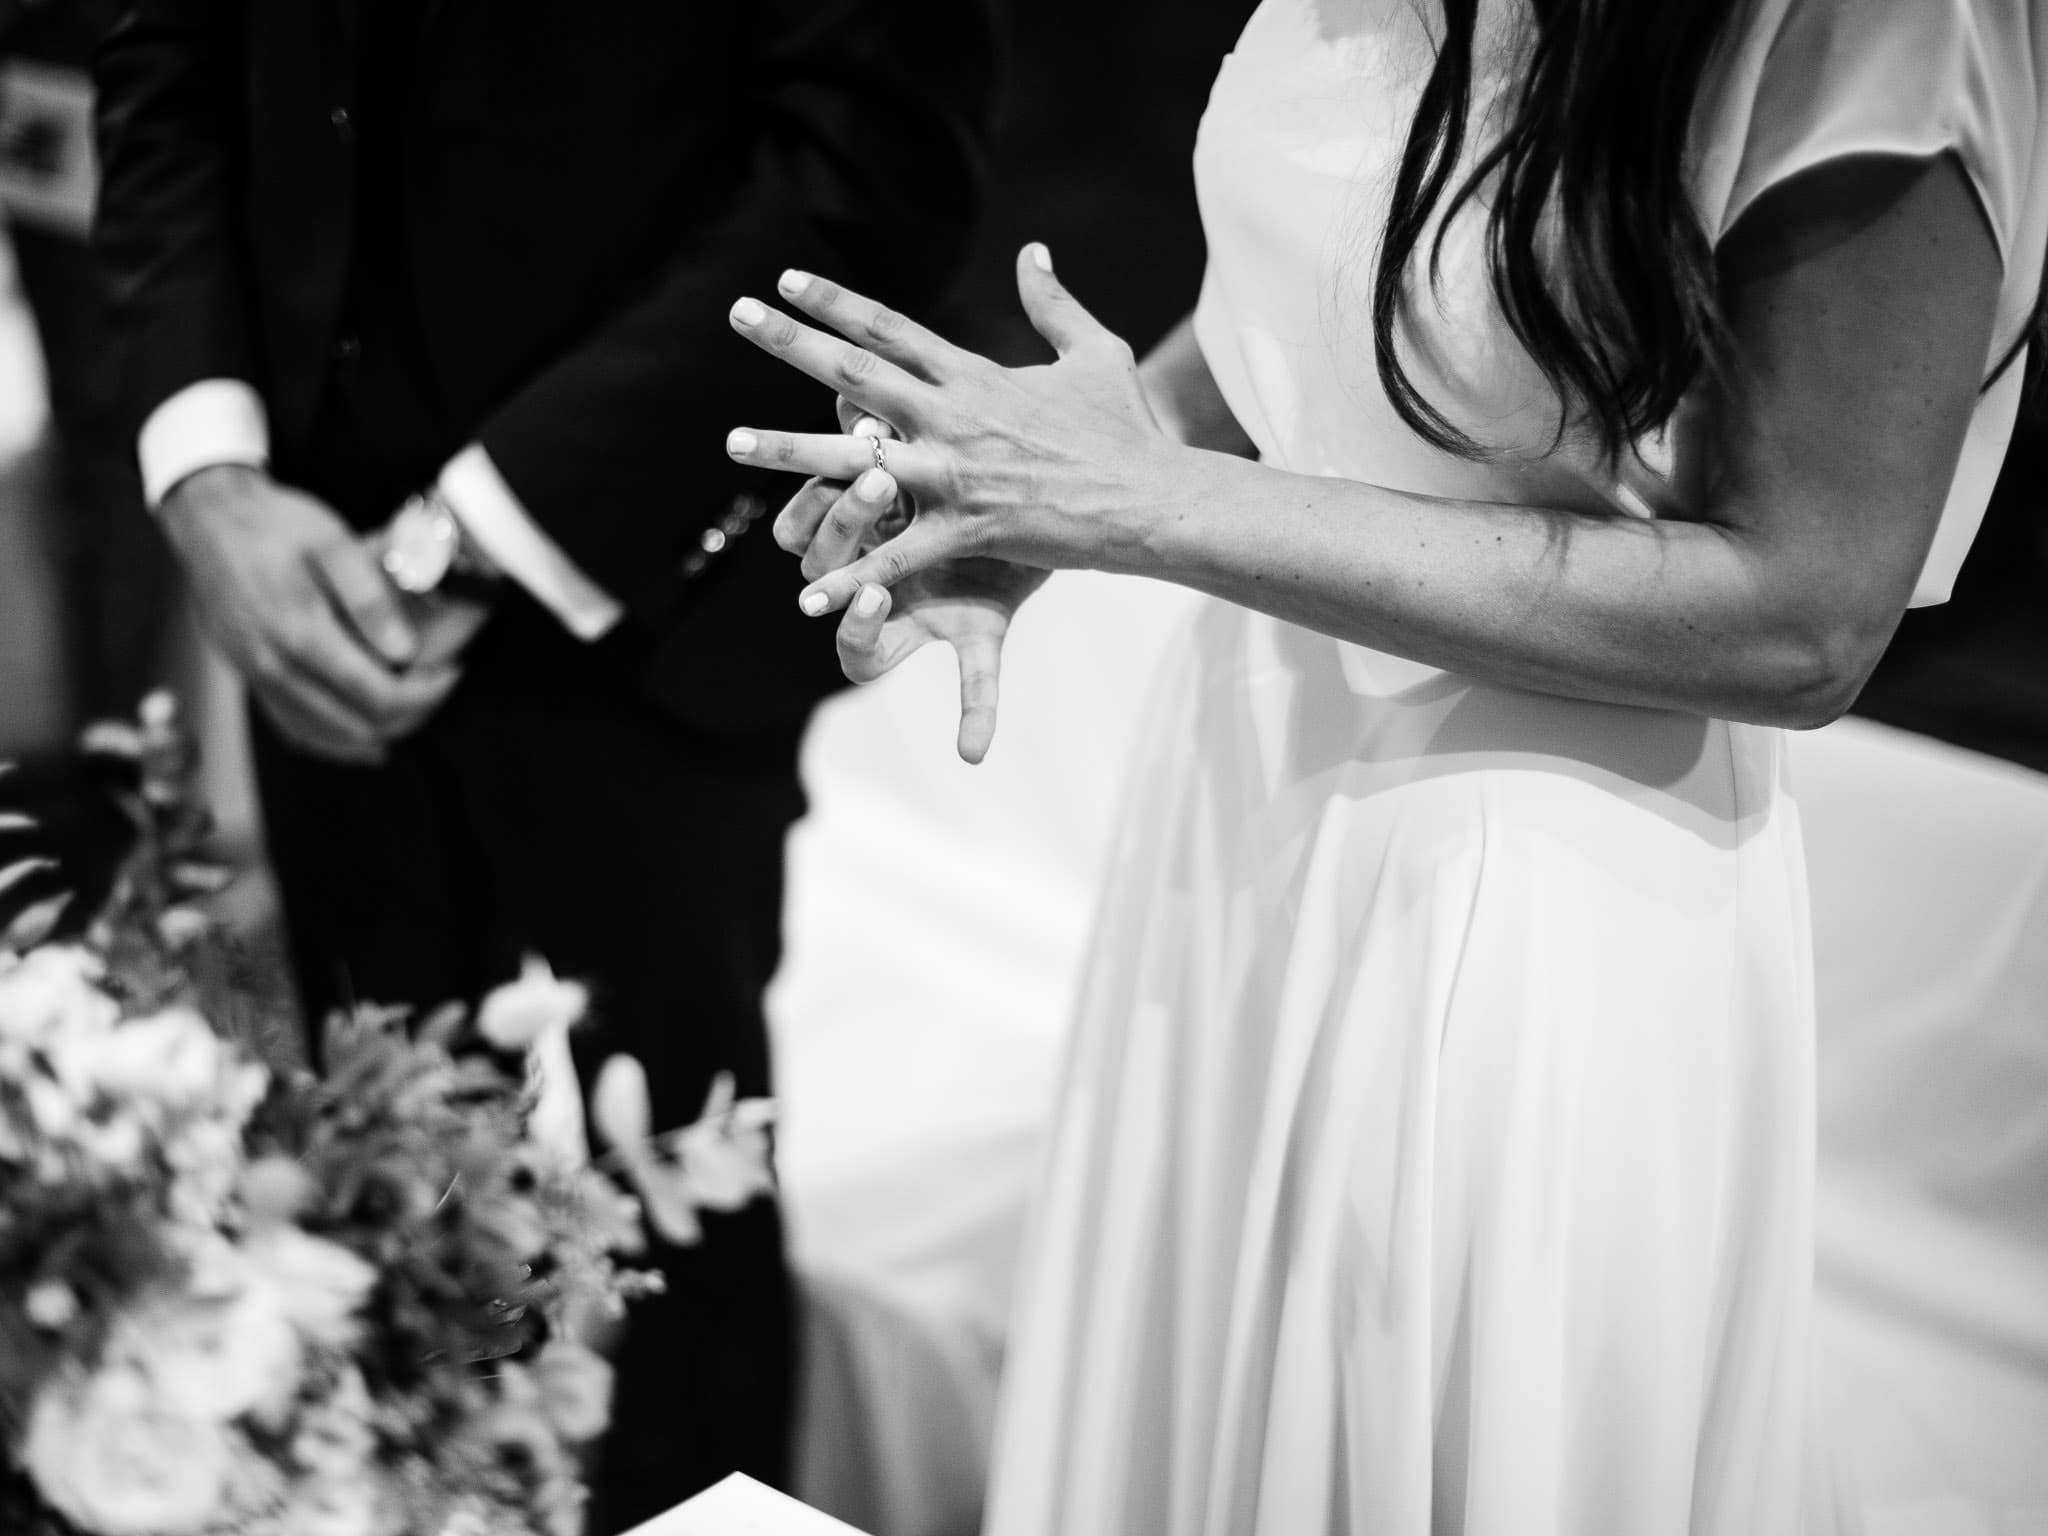 fotografo matrimonio lucarossifoto varese sacro monte Mulino dellOlio 30